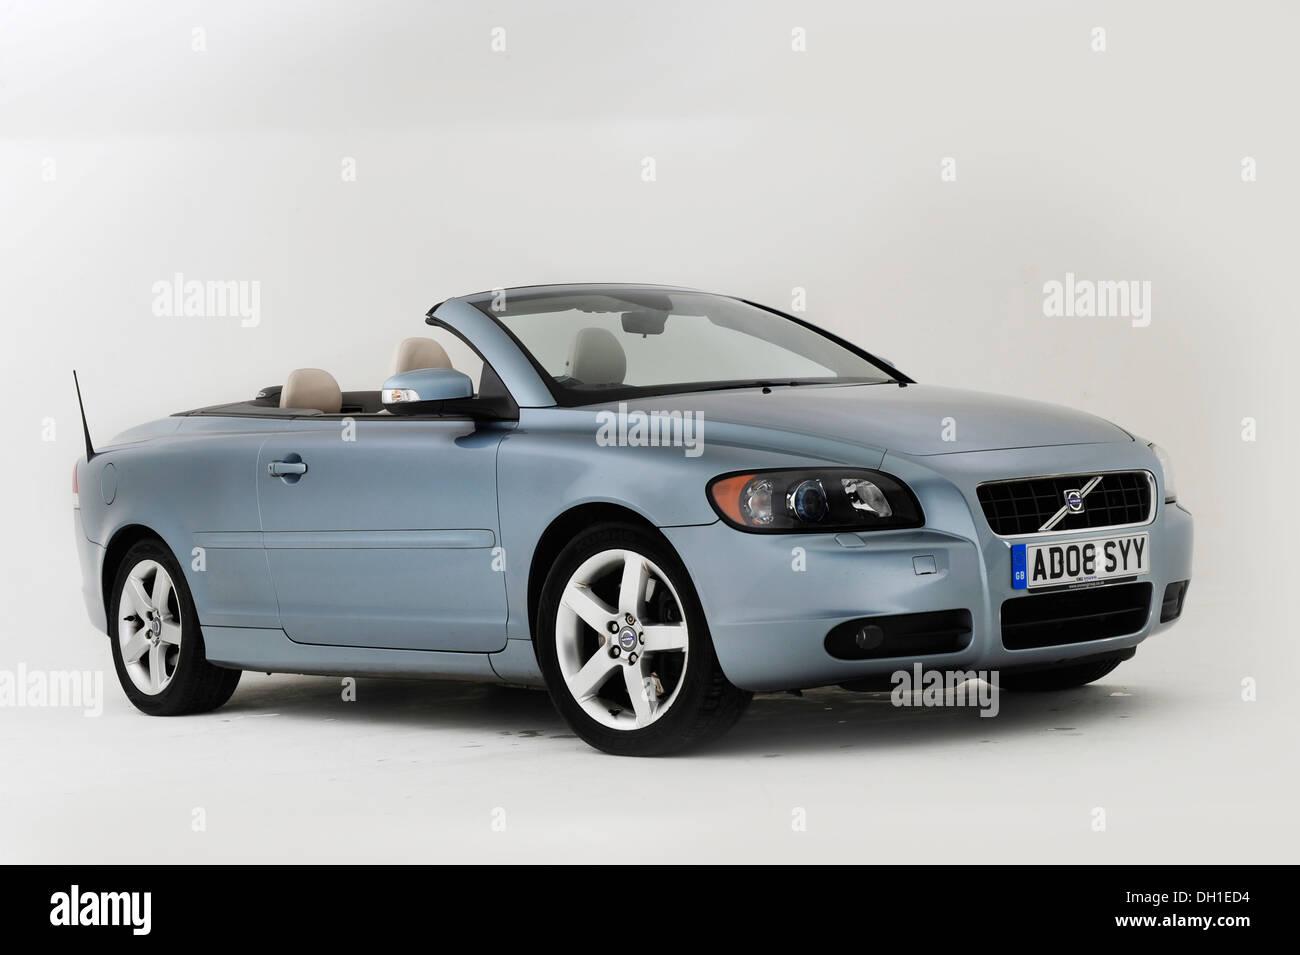 2008 Volvo C70 Convertible - Stock Image